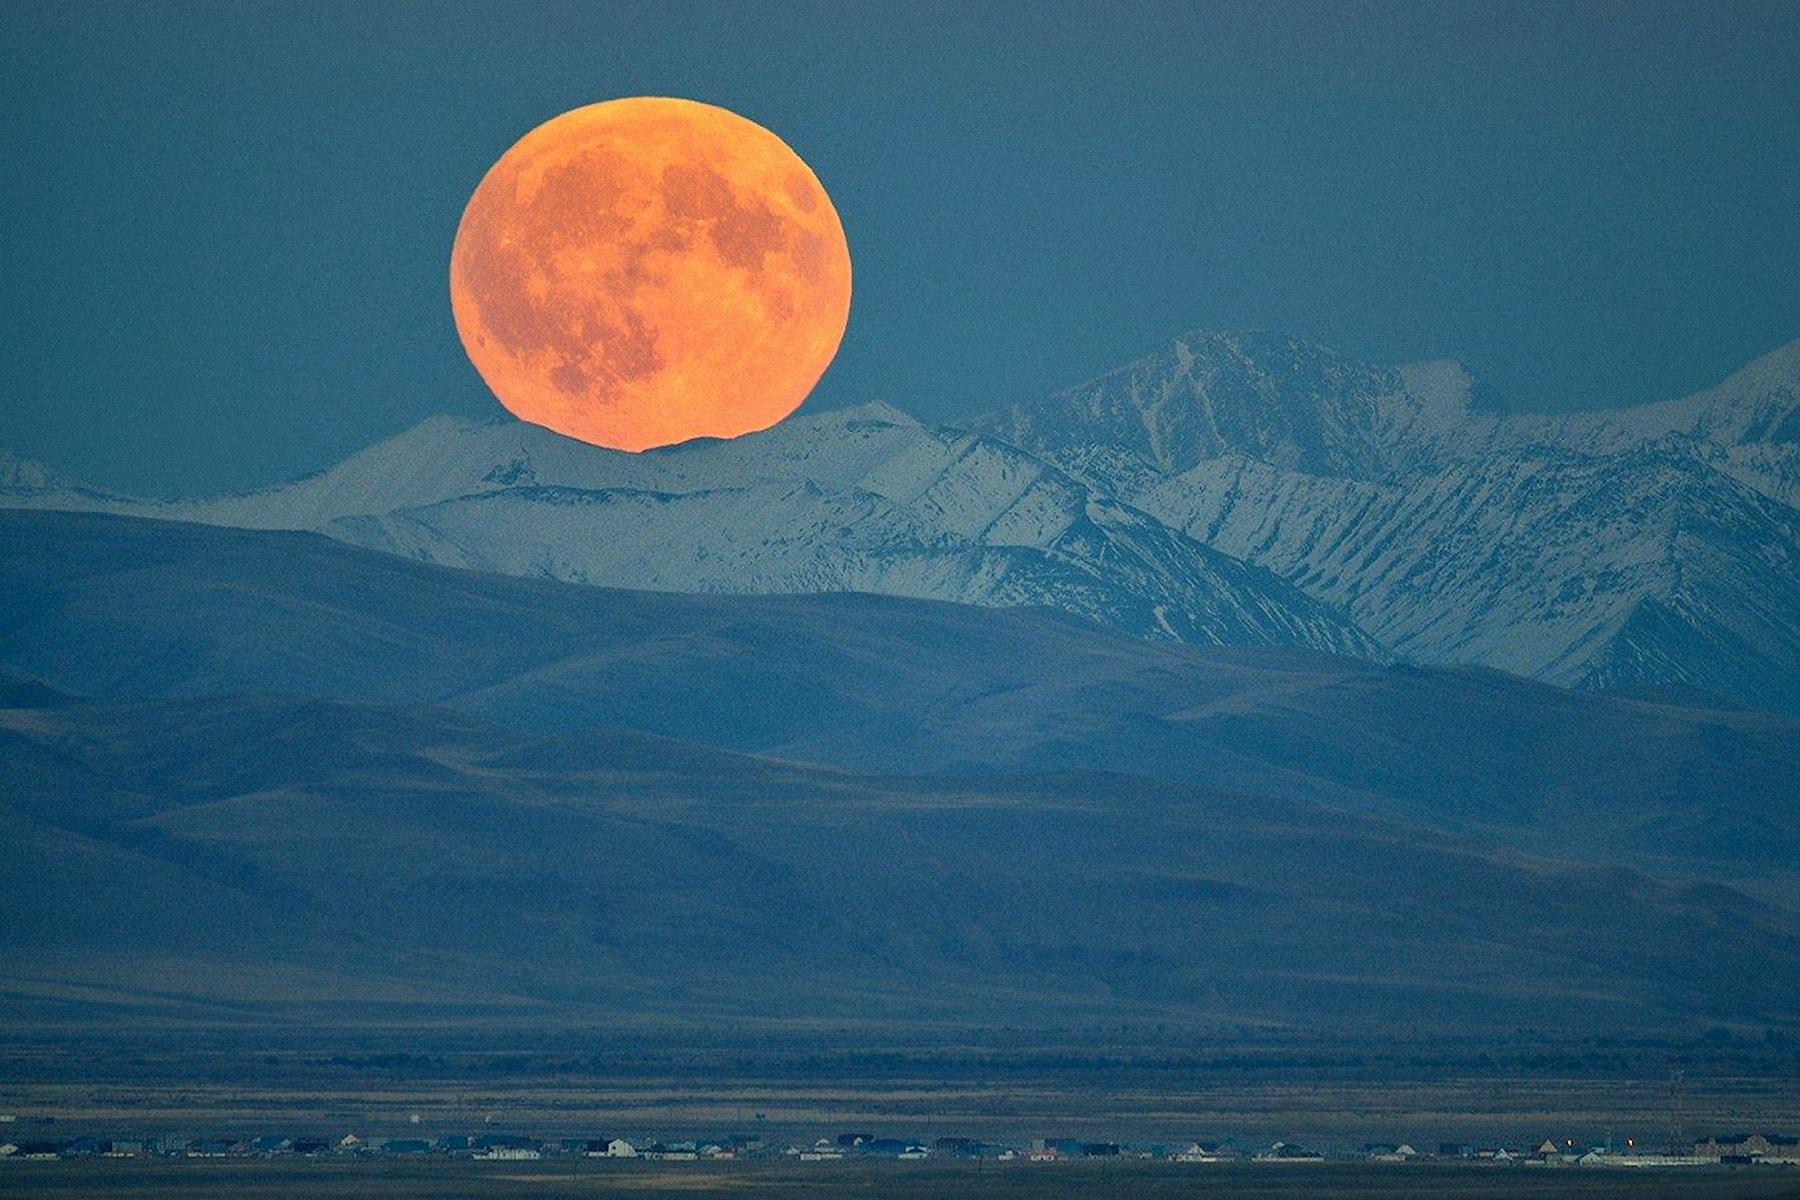 00-svetlana-kaina-full-moon-rising-on-the-edge-of-the-altai-mountains-in-mongolia-2016